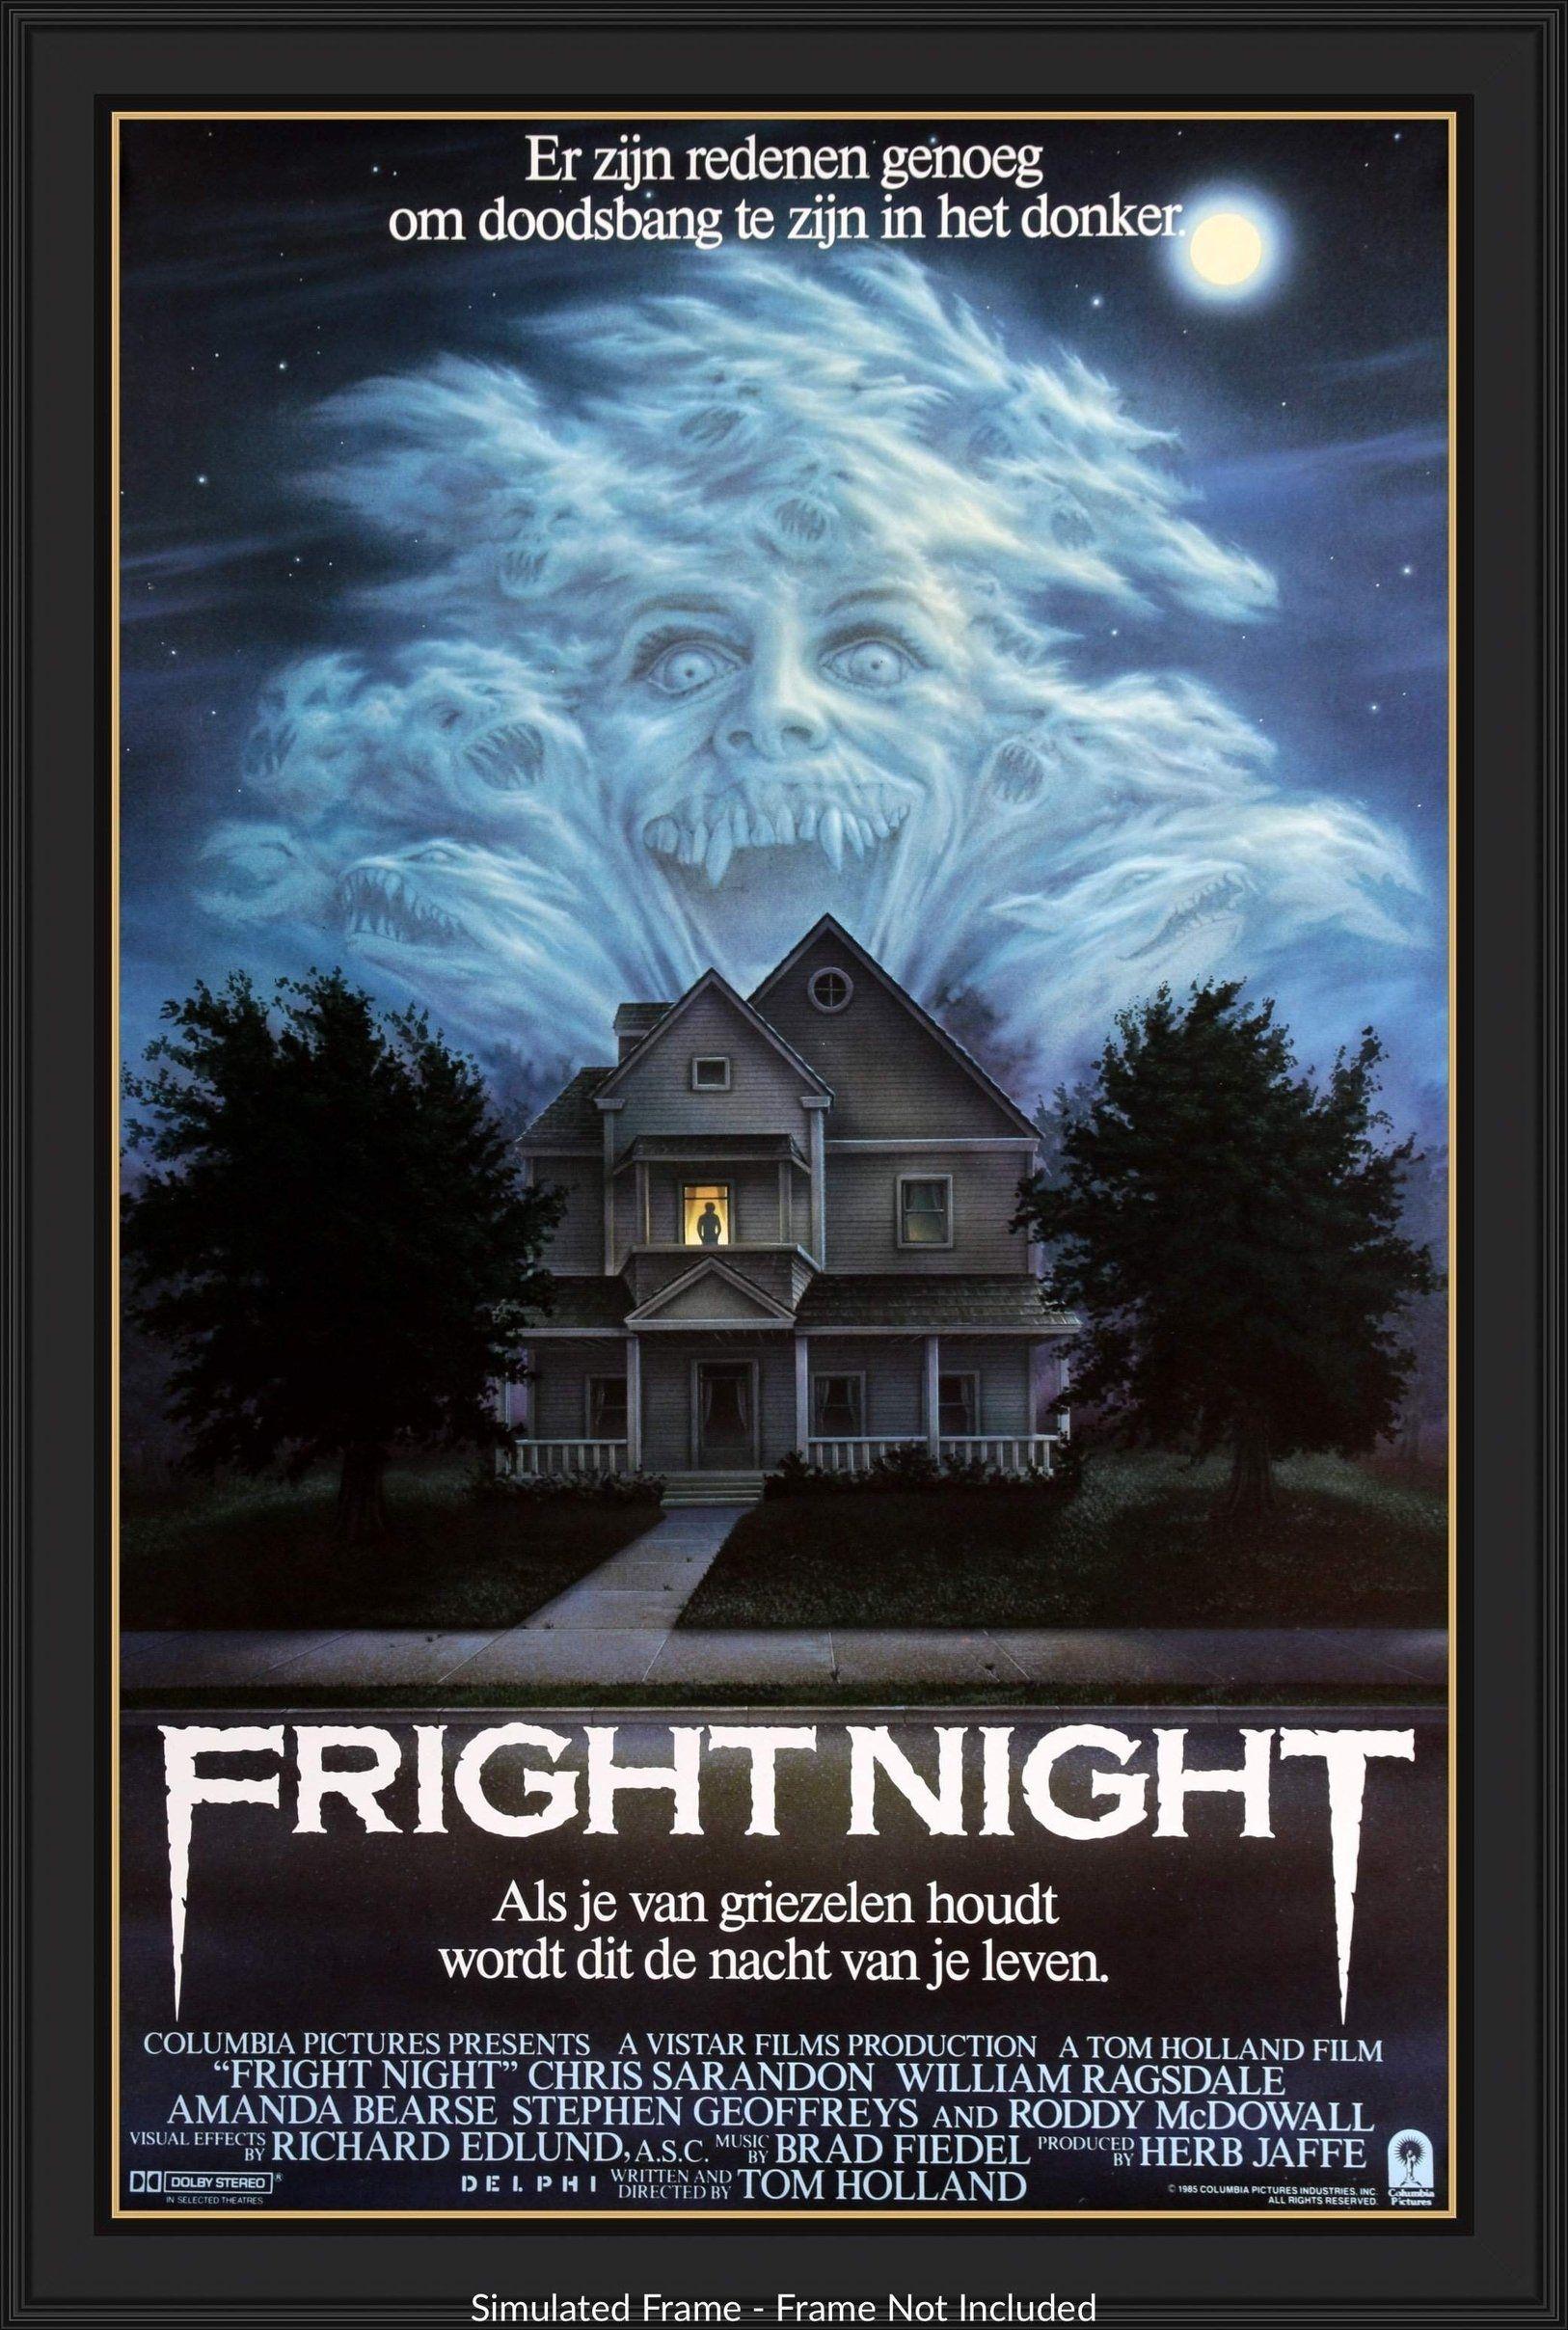 Fright Night 1985 Fright Night Tom Holland Best Movie Posters